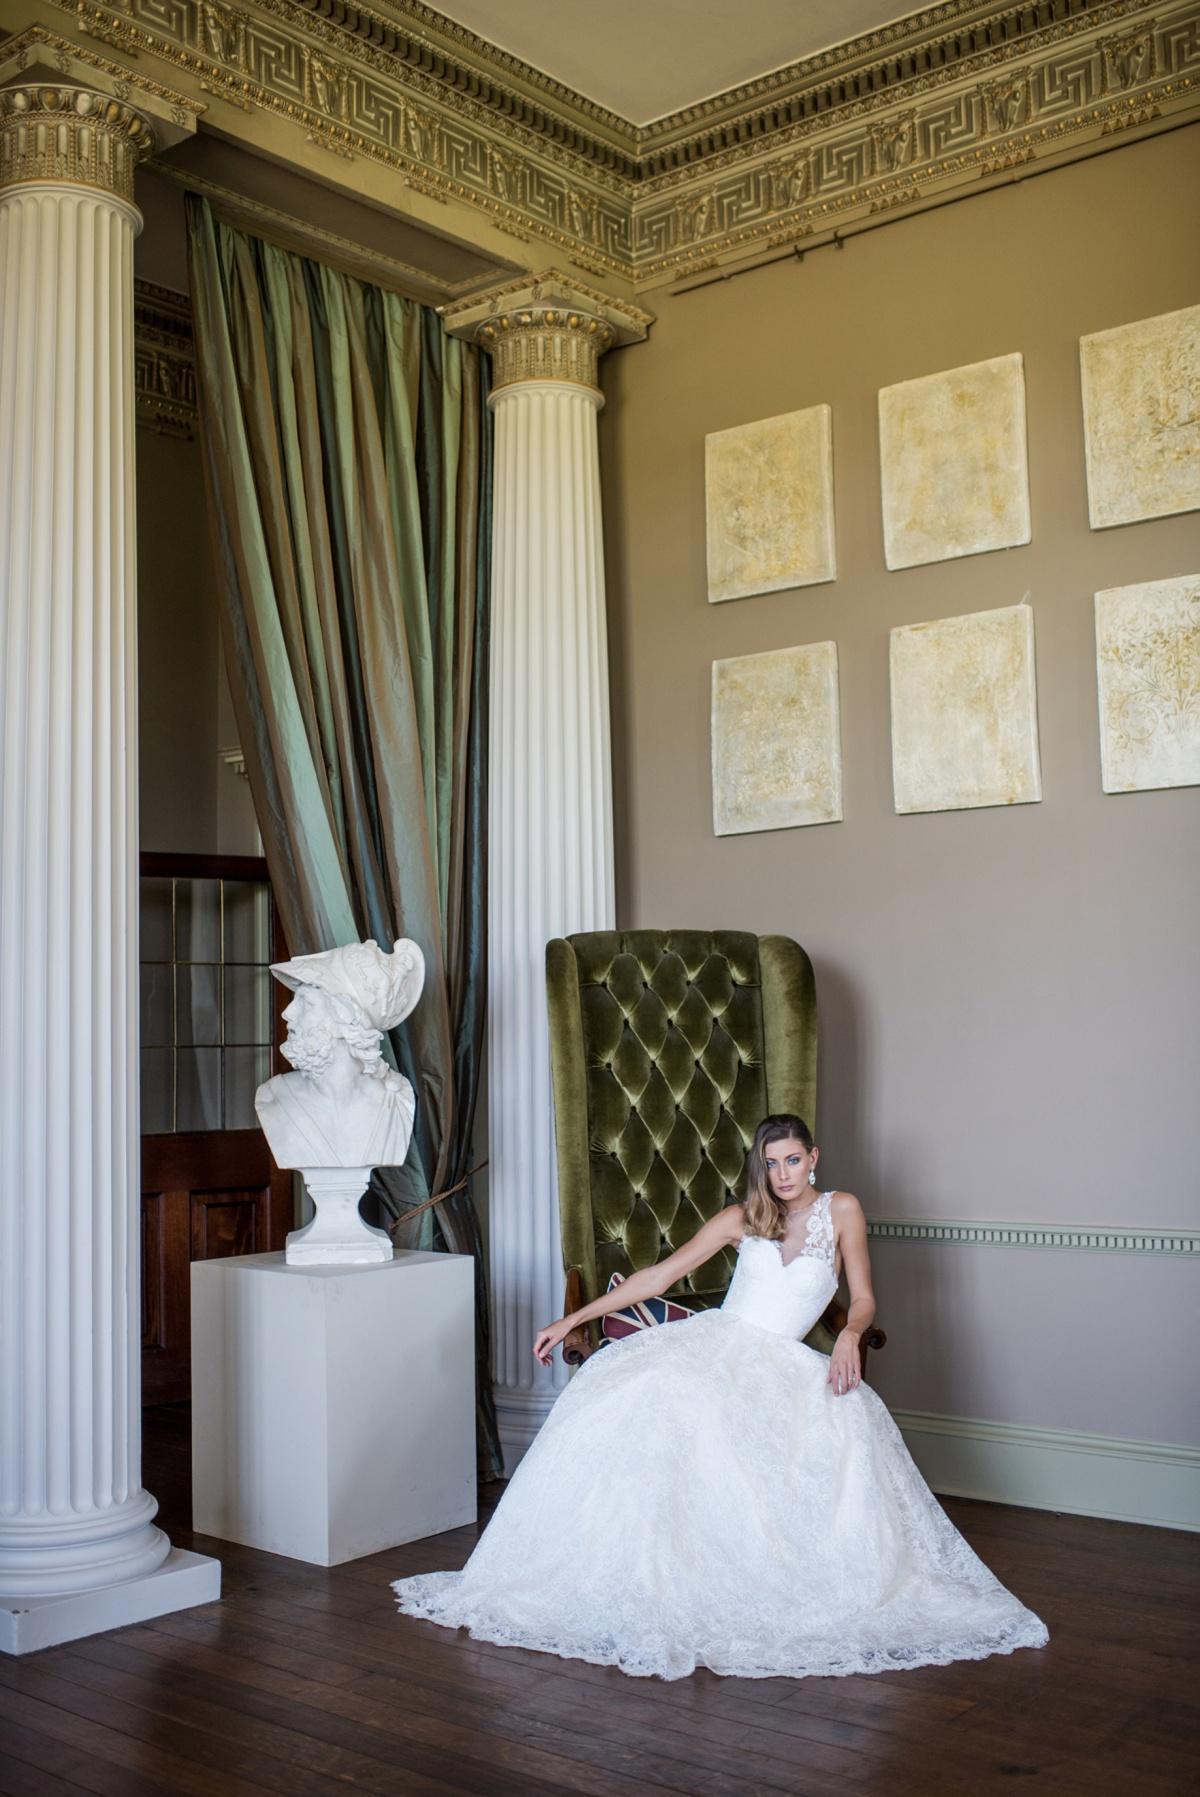 Caroline Castigliano x Howsham Hall (c) Jane Beadnell Photography (11)